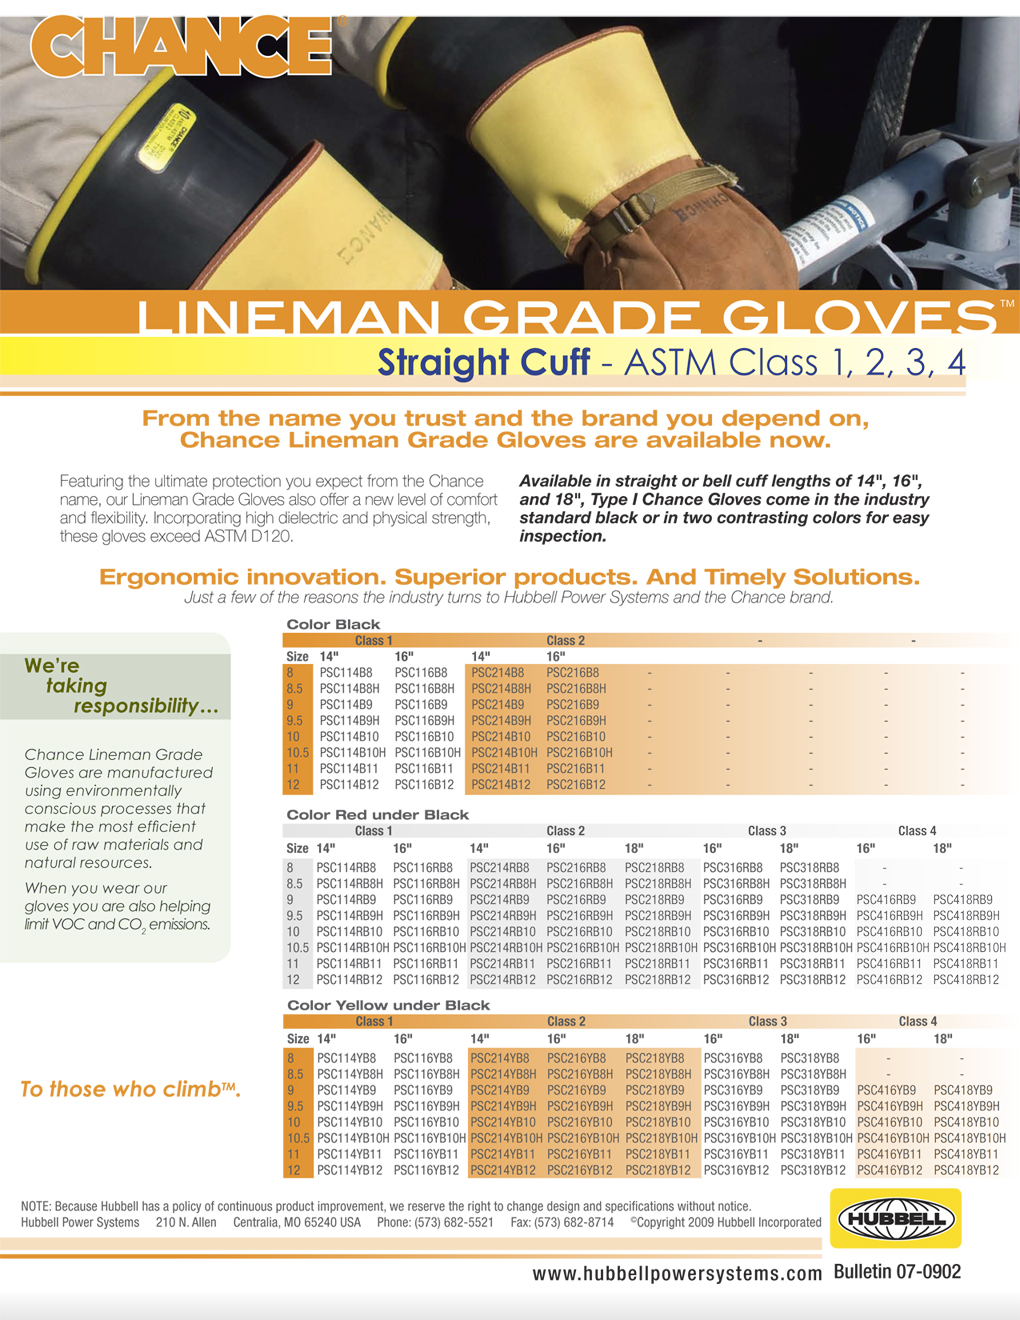 "HPS PSC218YB9 CHANCE CLASS II 18""YEL/BLK SZ 9"